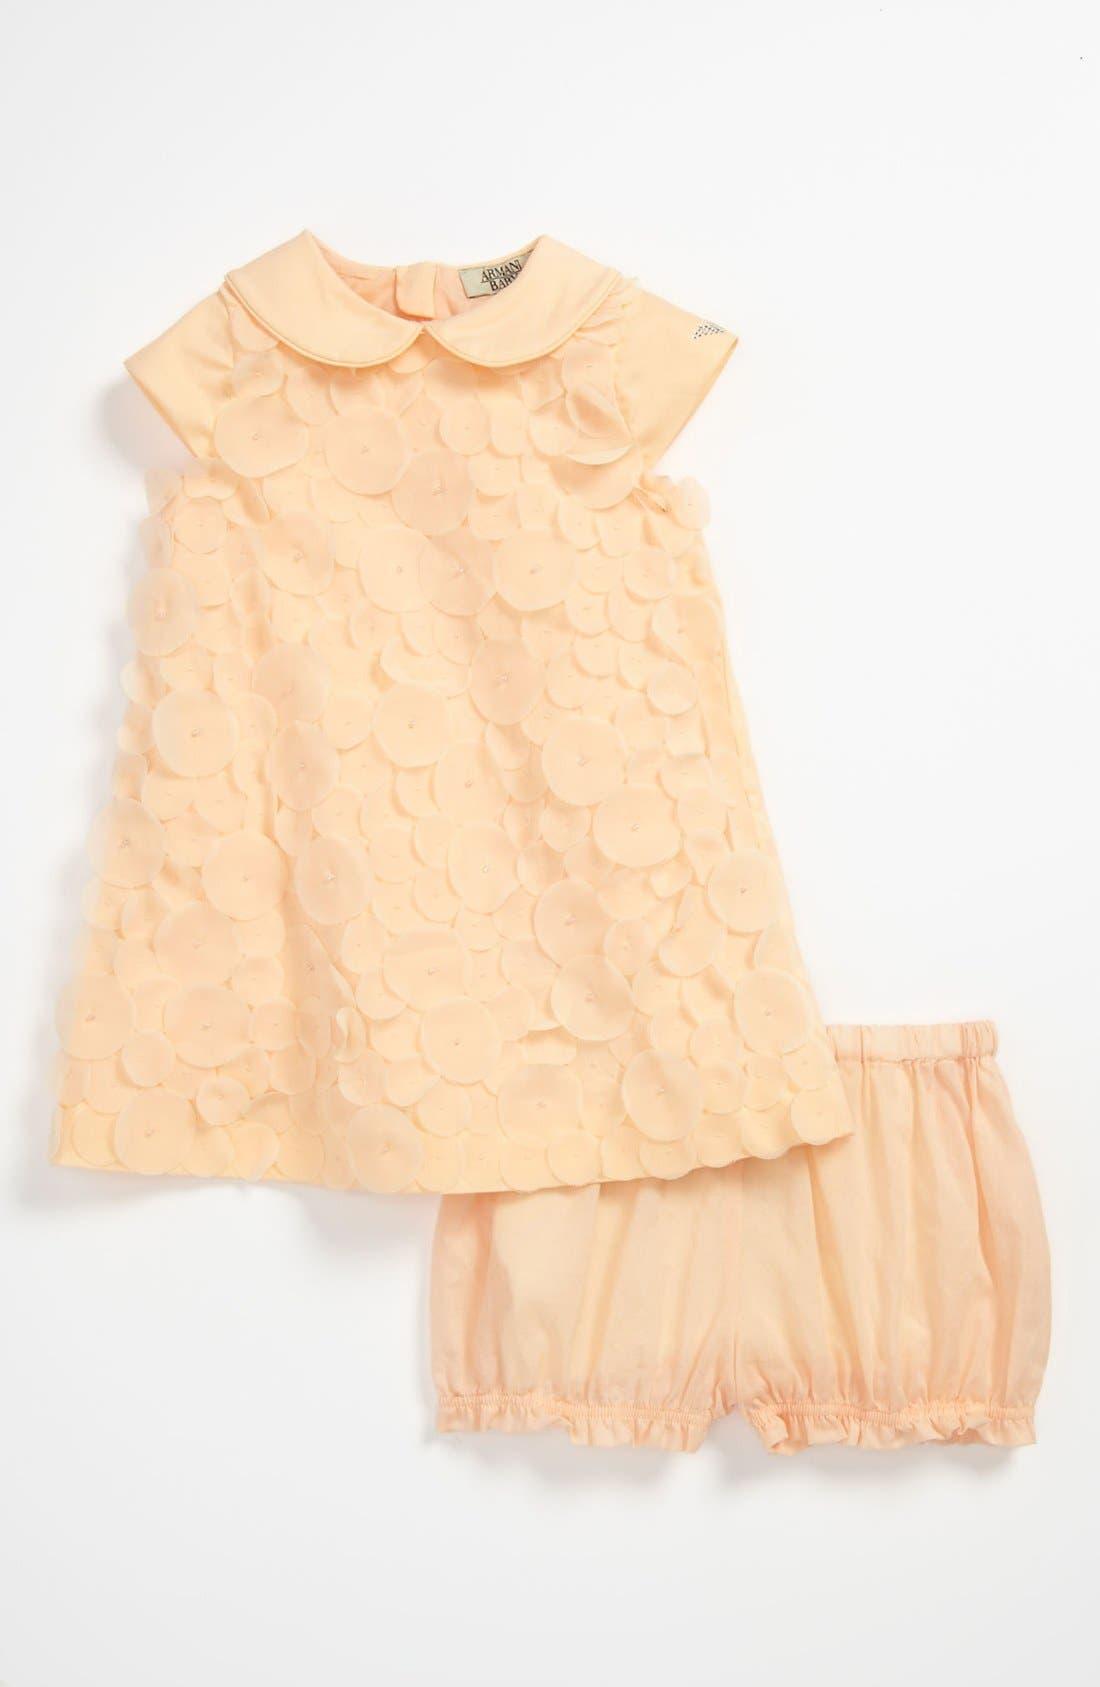 Alternate Image 1 Selected - Armani Junior 'Disc' Dress & Bloomers (Baby)